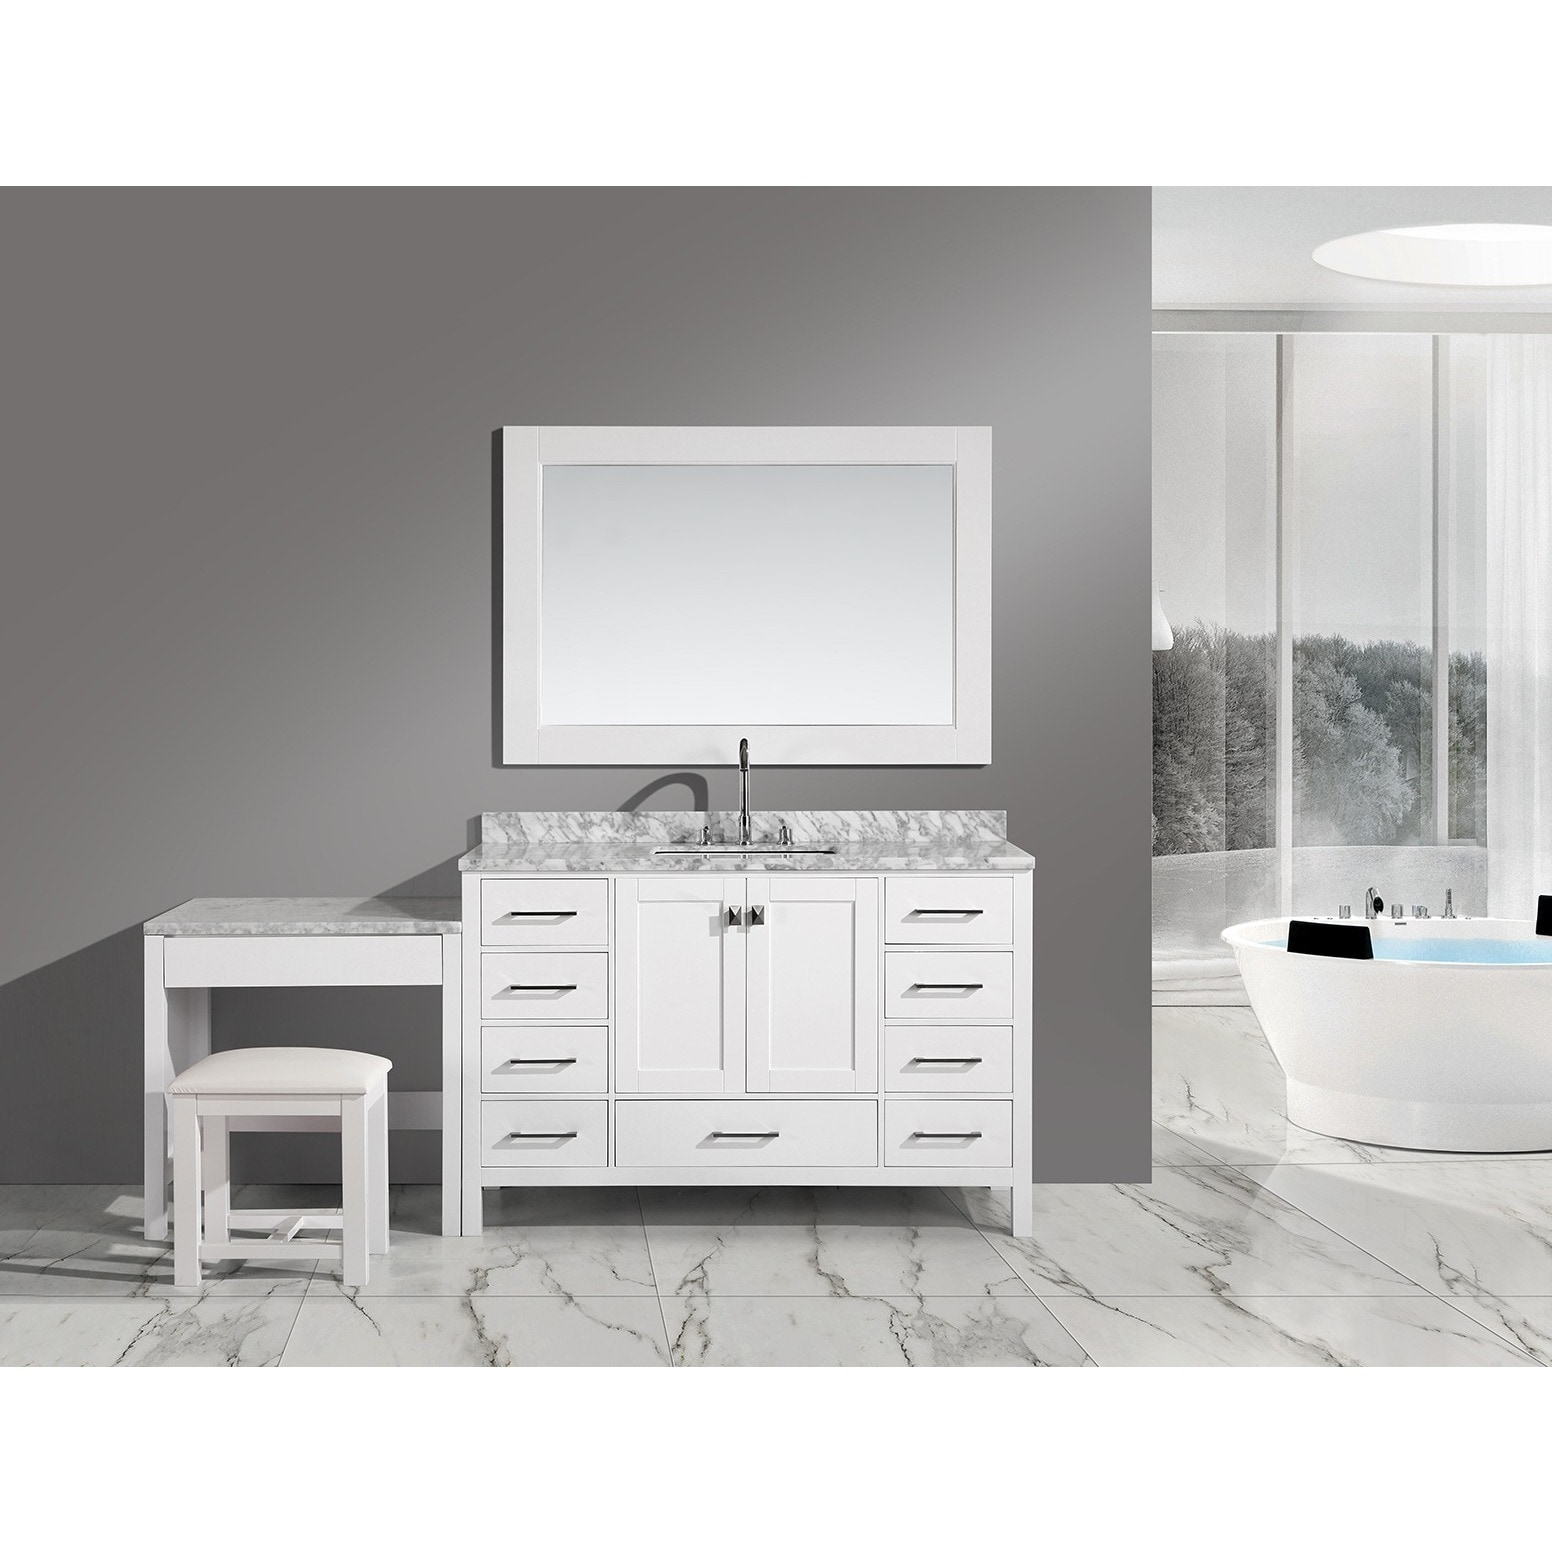 Shop Design Element London 78-inch Single Sink White Vanity Set with ...